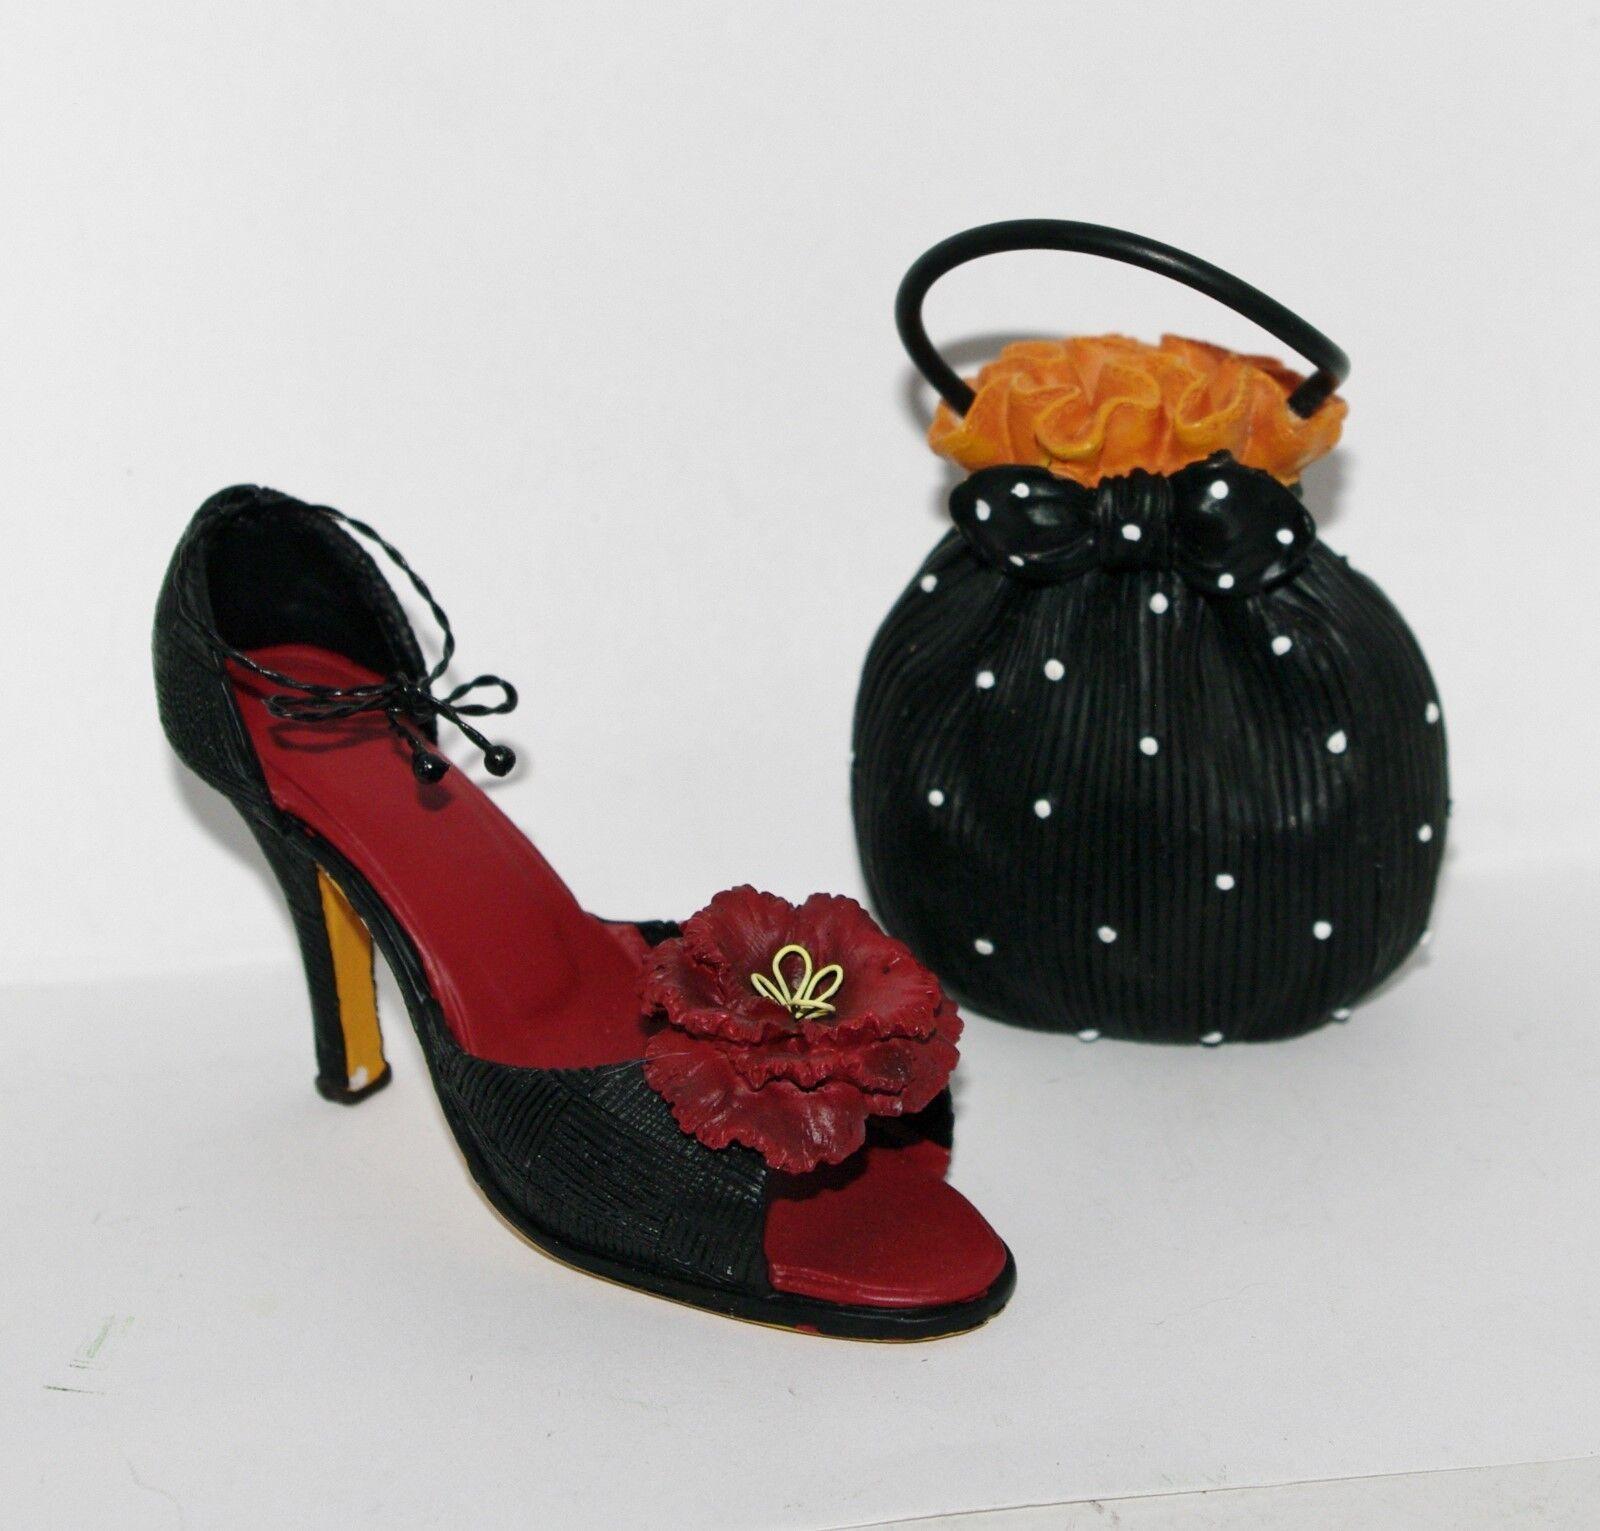 JC Penney FUNKY SANDAL Red Flower Black HIGH HEEL SHOE Polka Dot PURSE Ornaments